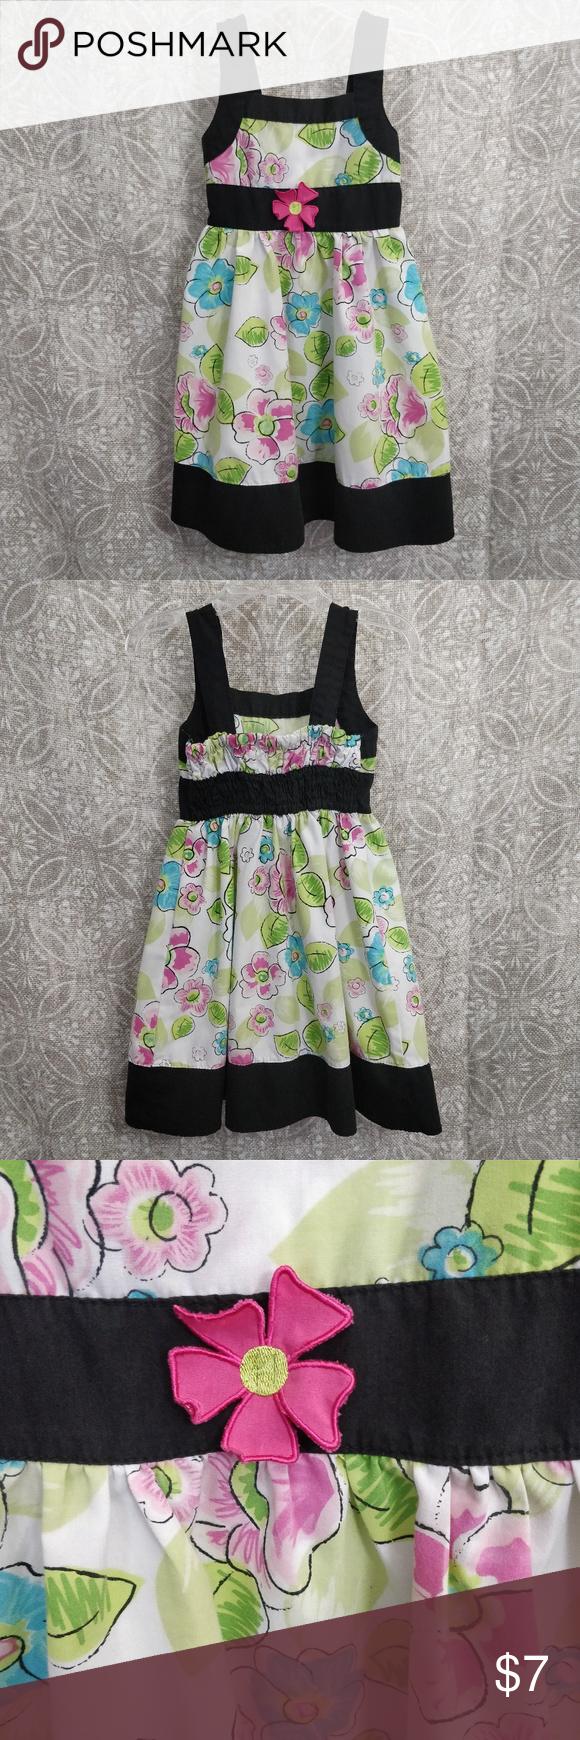 4t Adjustable Strap Sun Dress Clothes Design Dresses Adjustable Strap Dress [ 1740 x 580 Pixel ]